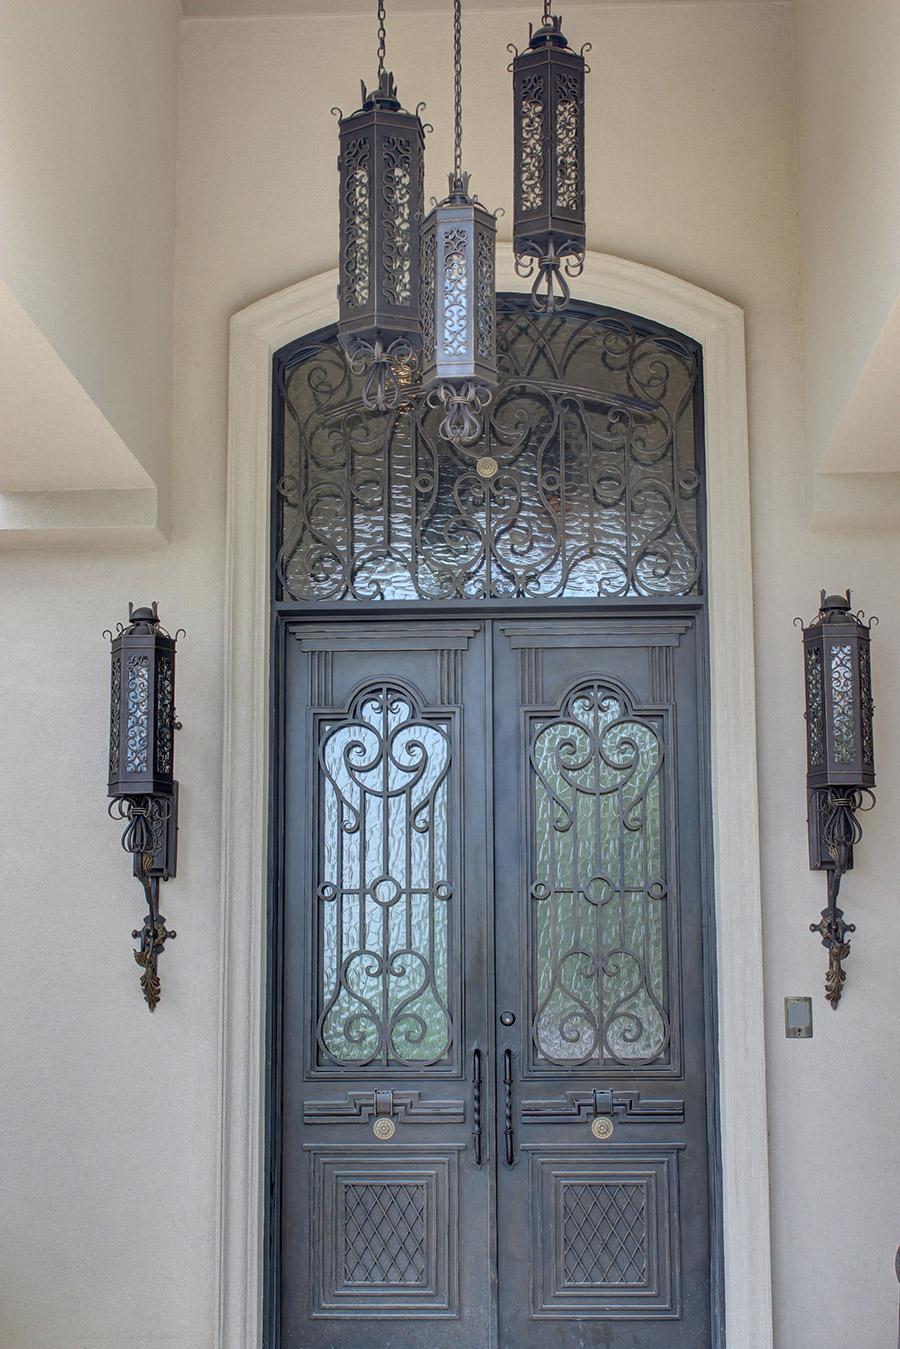 Victory-iron-lighting-fixture-foyer-hall-pendant-entry-kitchen-wrouhgt-iron-door-solara-ligthing-E007-013-EG-(3)